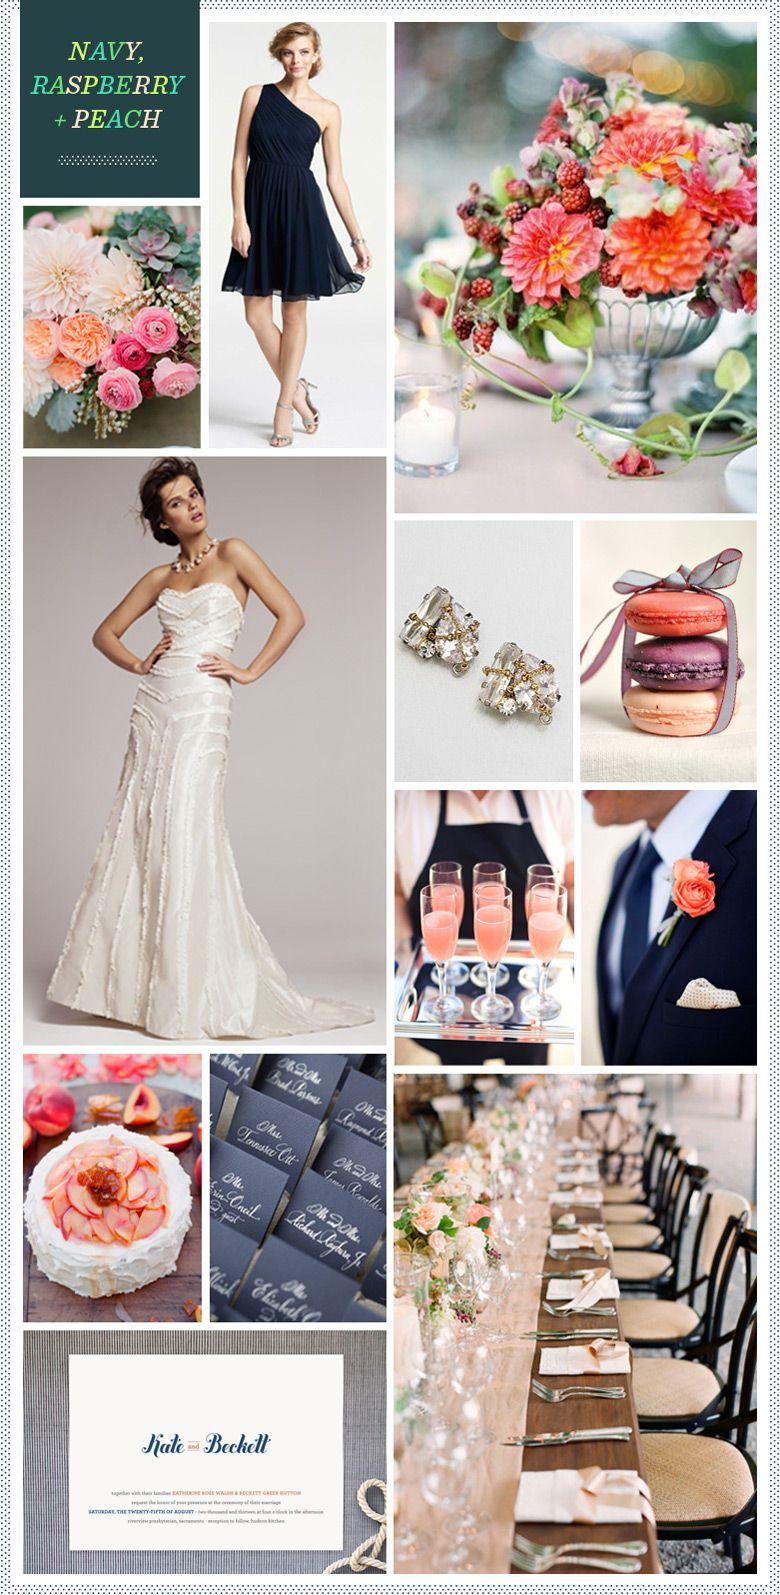 REVEL: Navy, Raspberry + Peach wedding inspiration